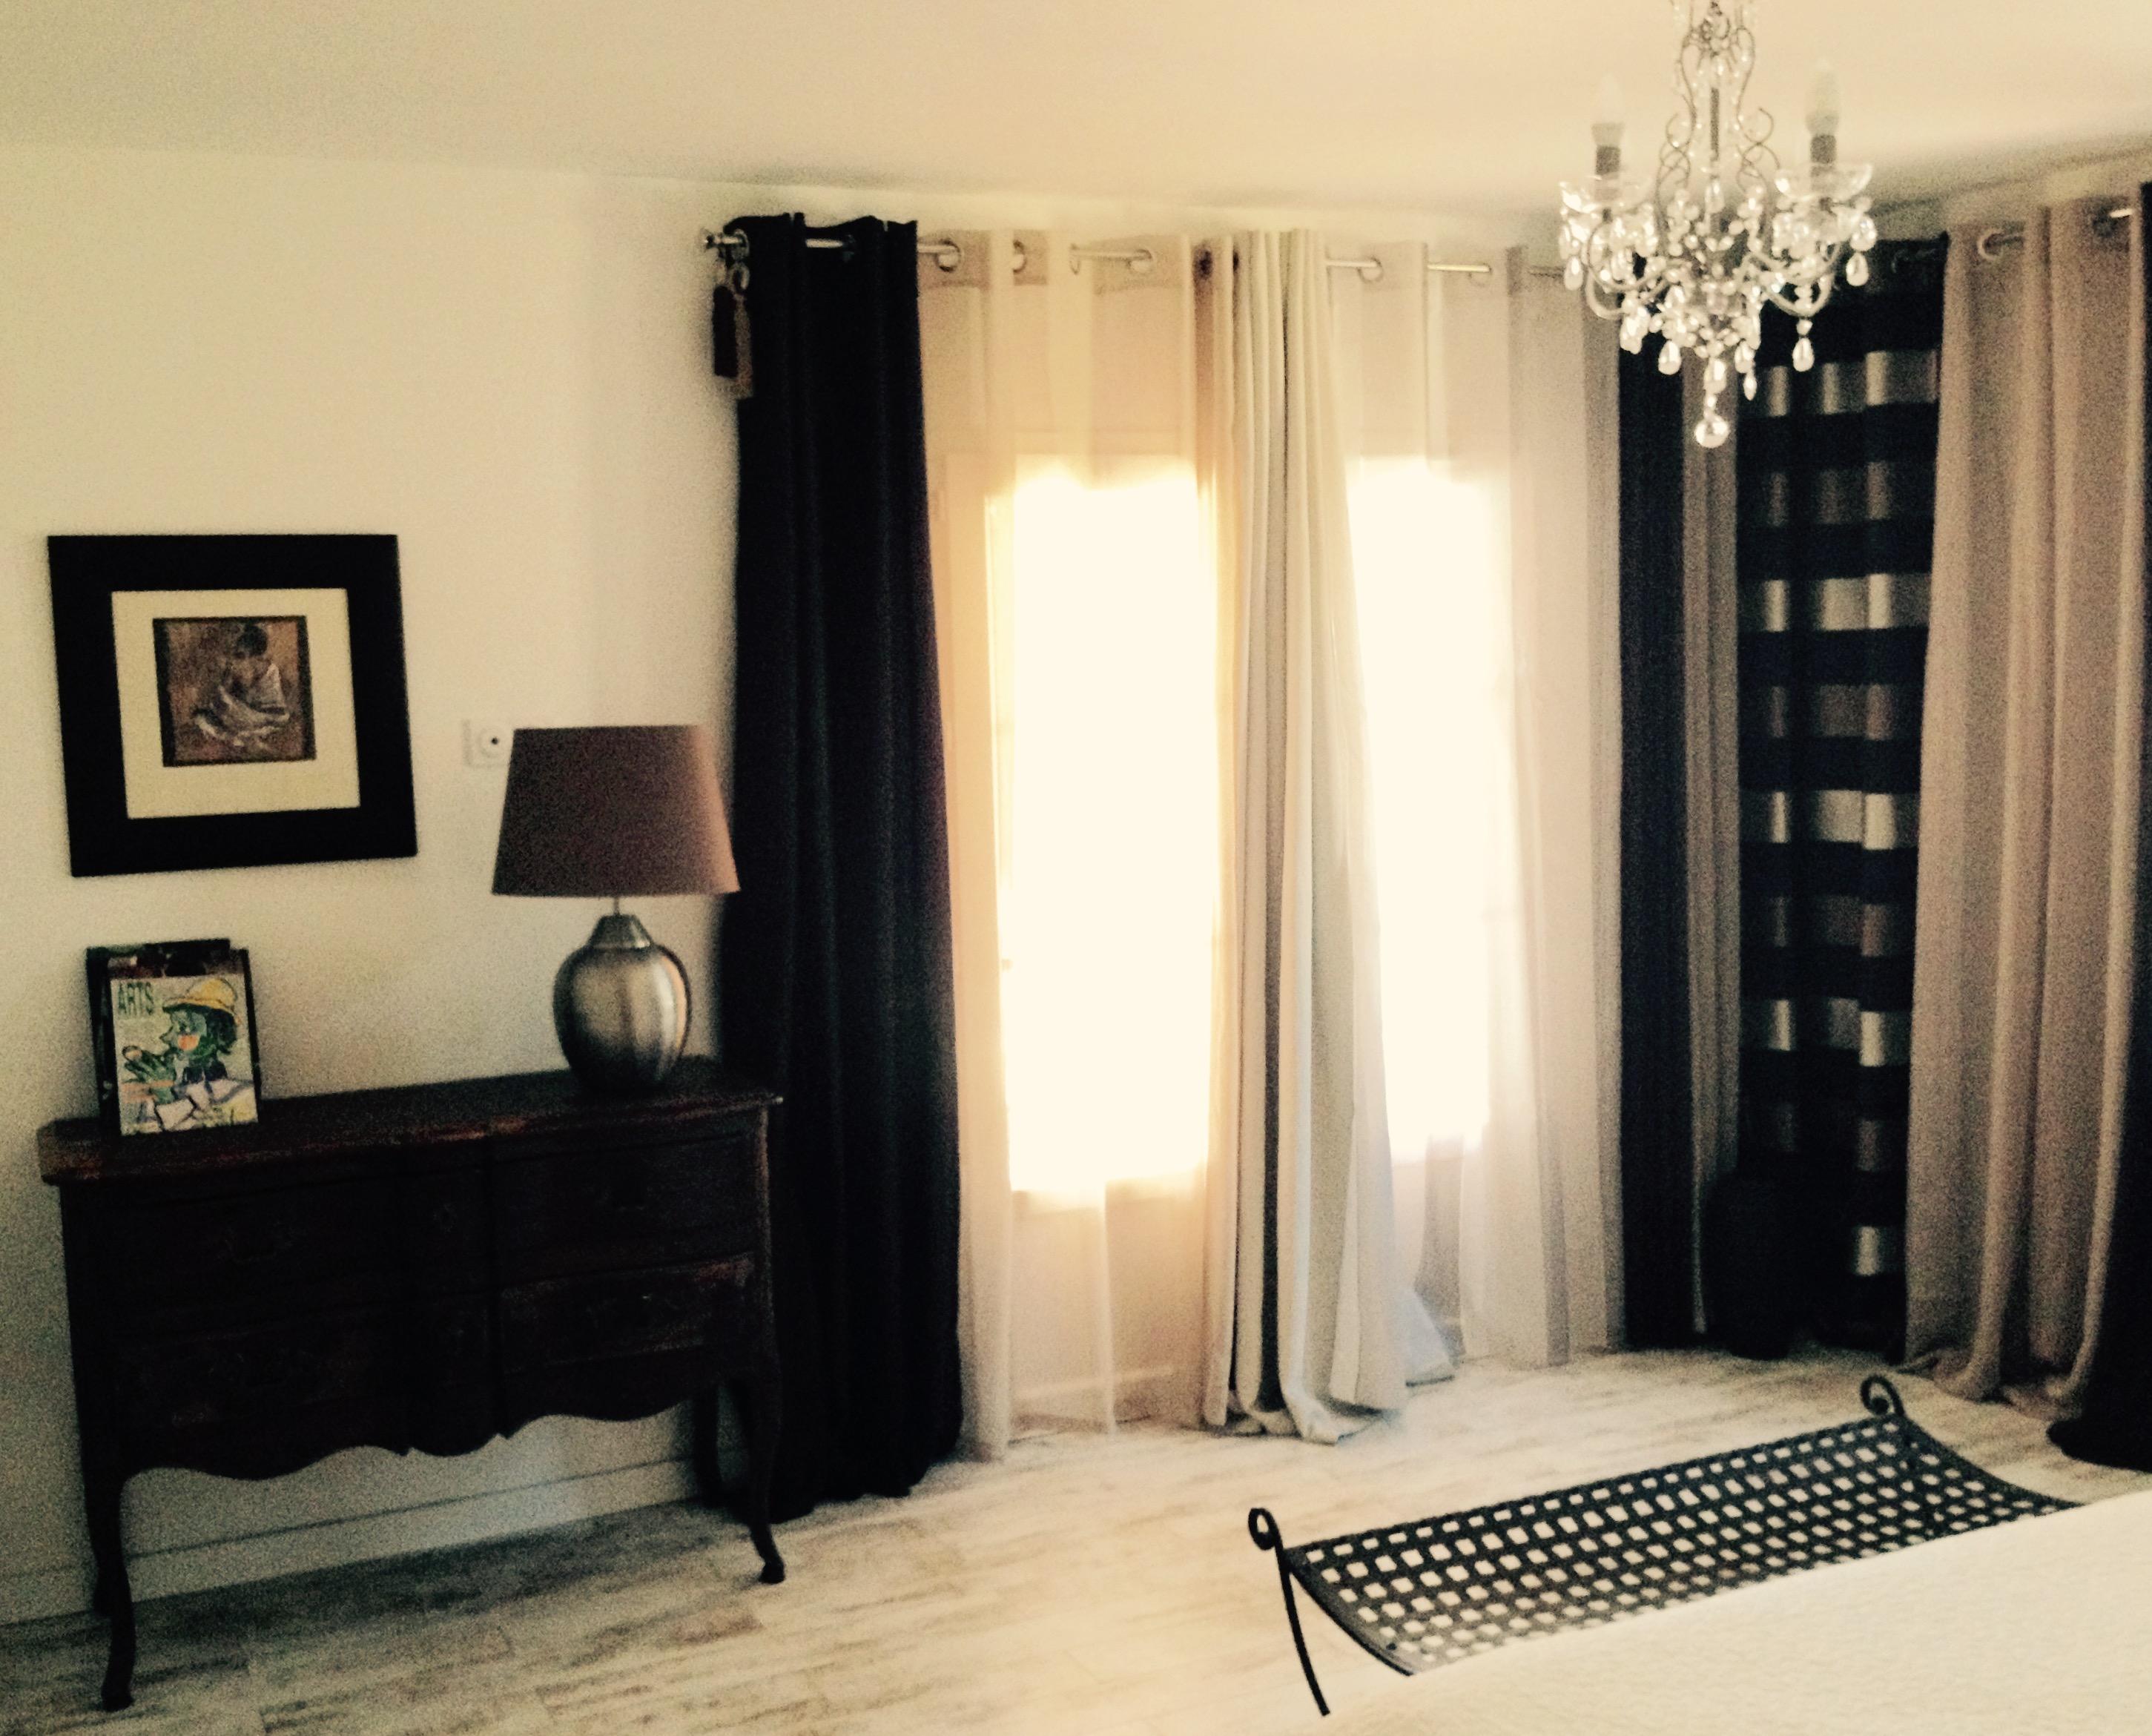 BELLA BAHIA chambre double luxe